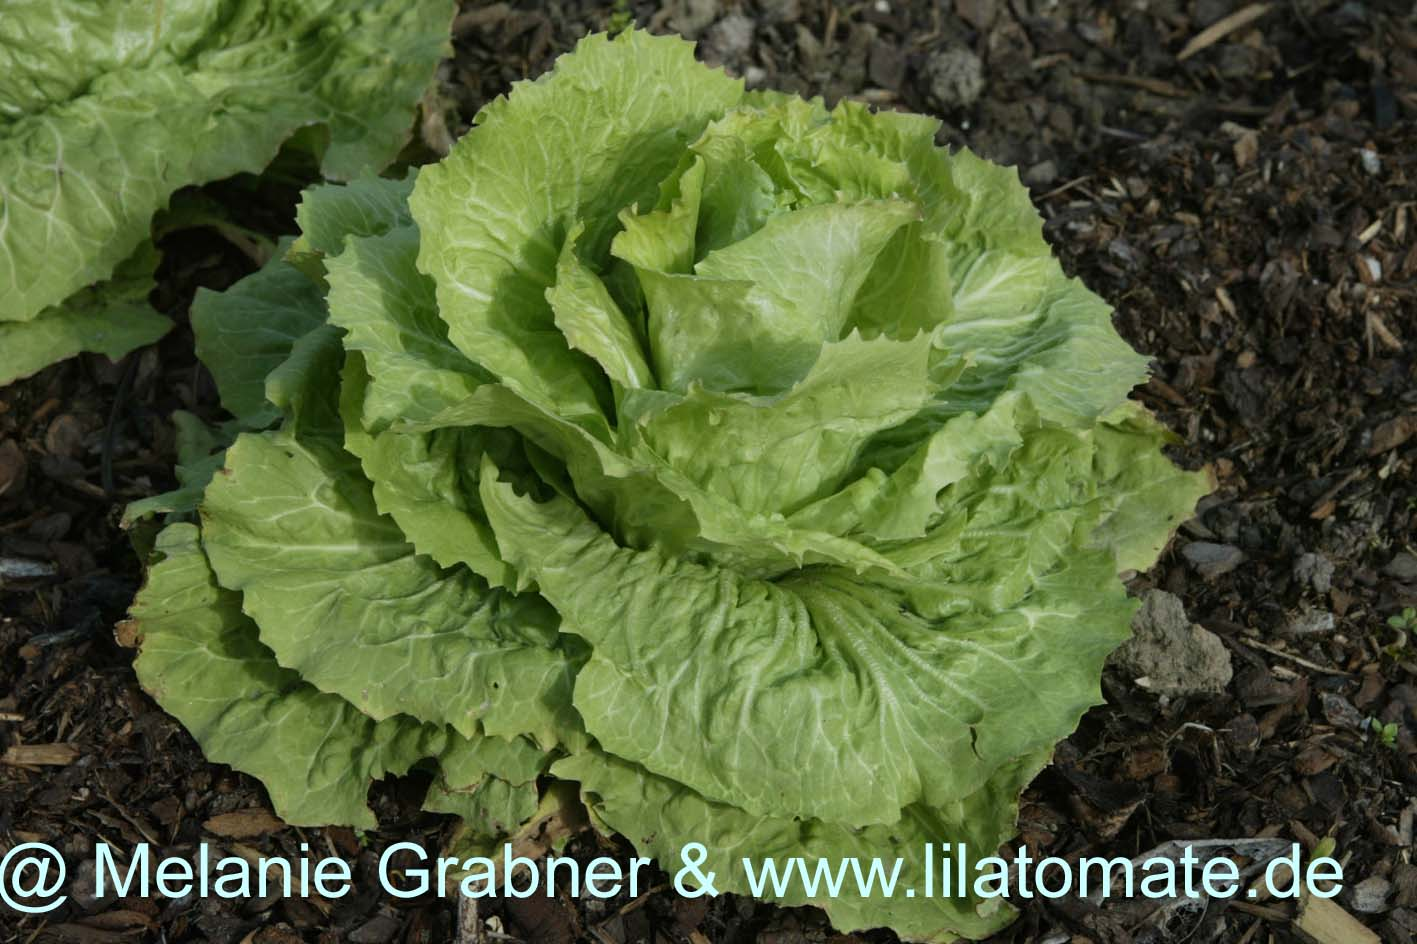 Salat Sortenmischung 'Kopfsalat' Saatgut